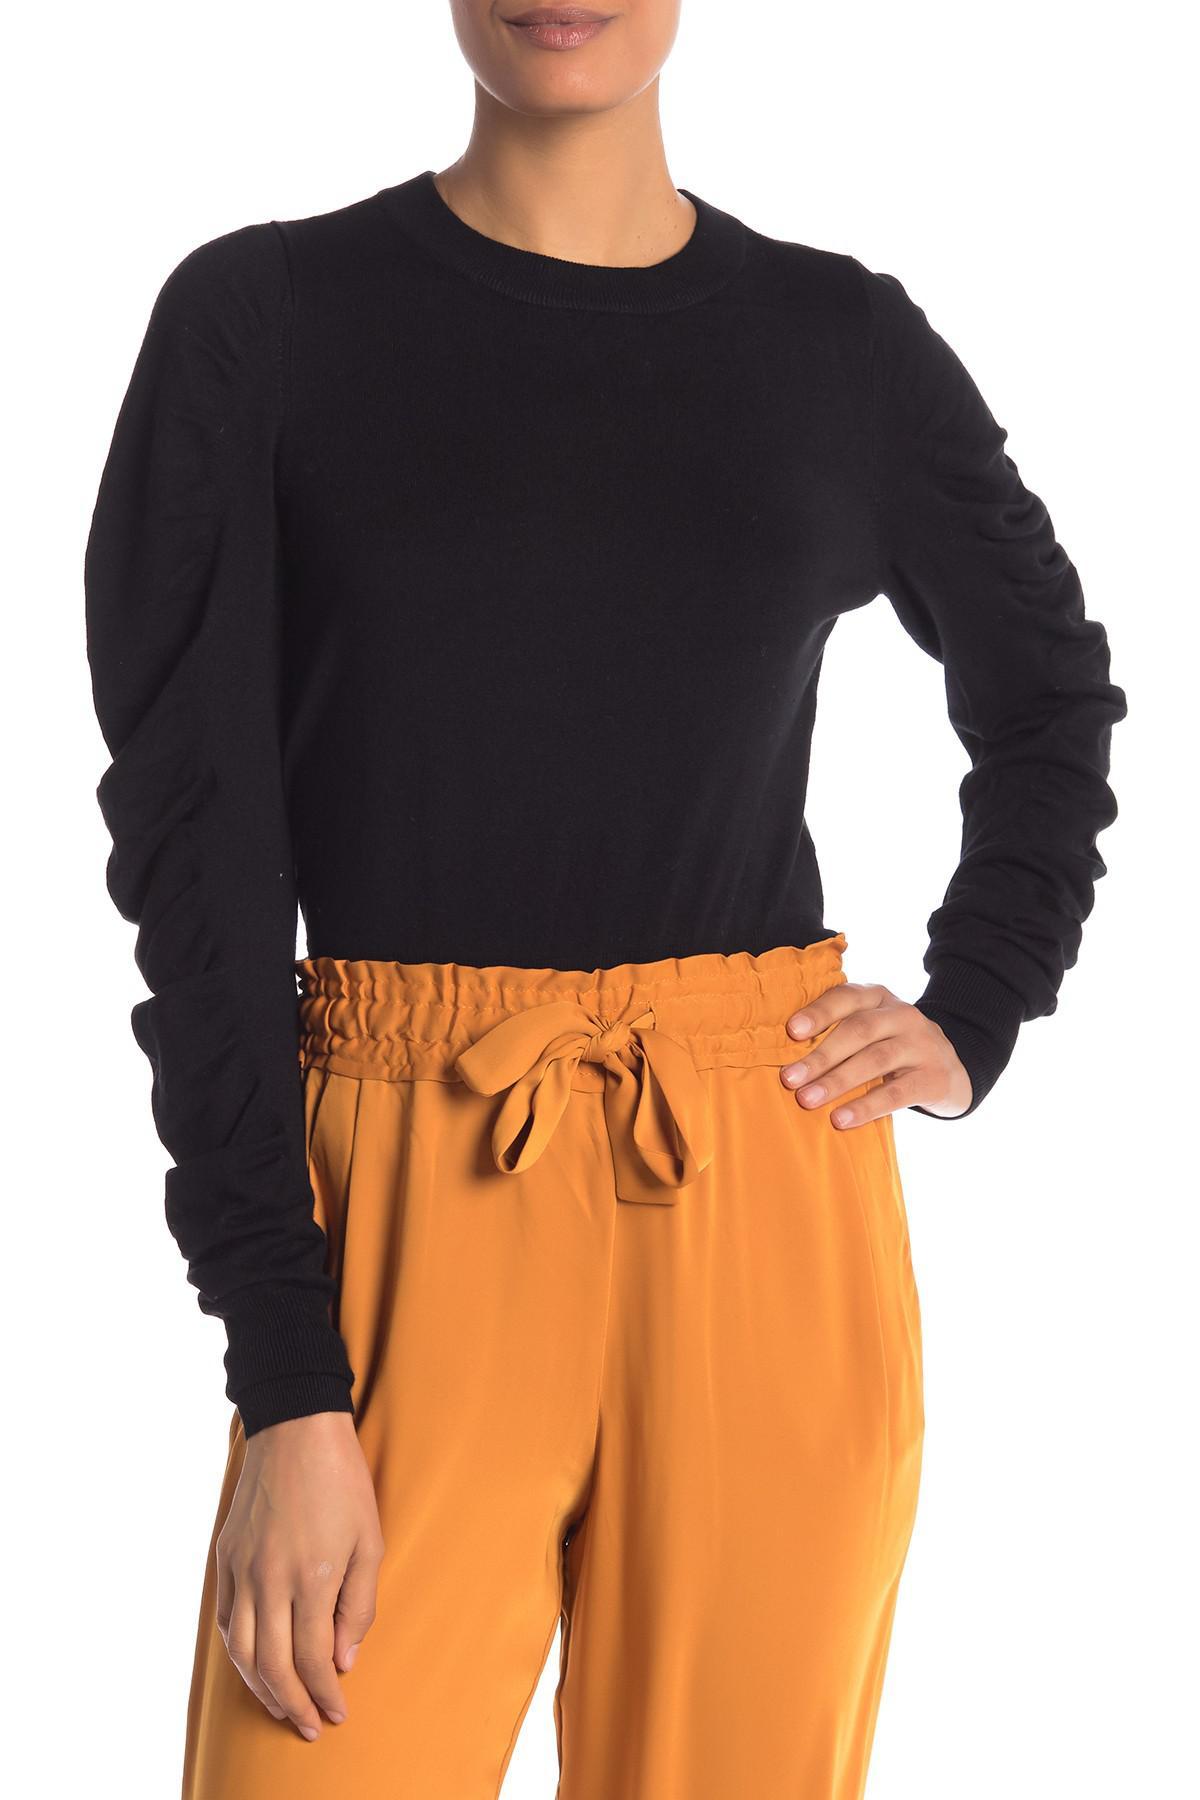 Lyst - Vero Moda Gathered Sleeve Knit Sweater in Black bba5c108a167